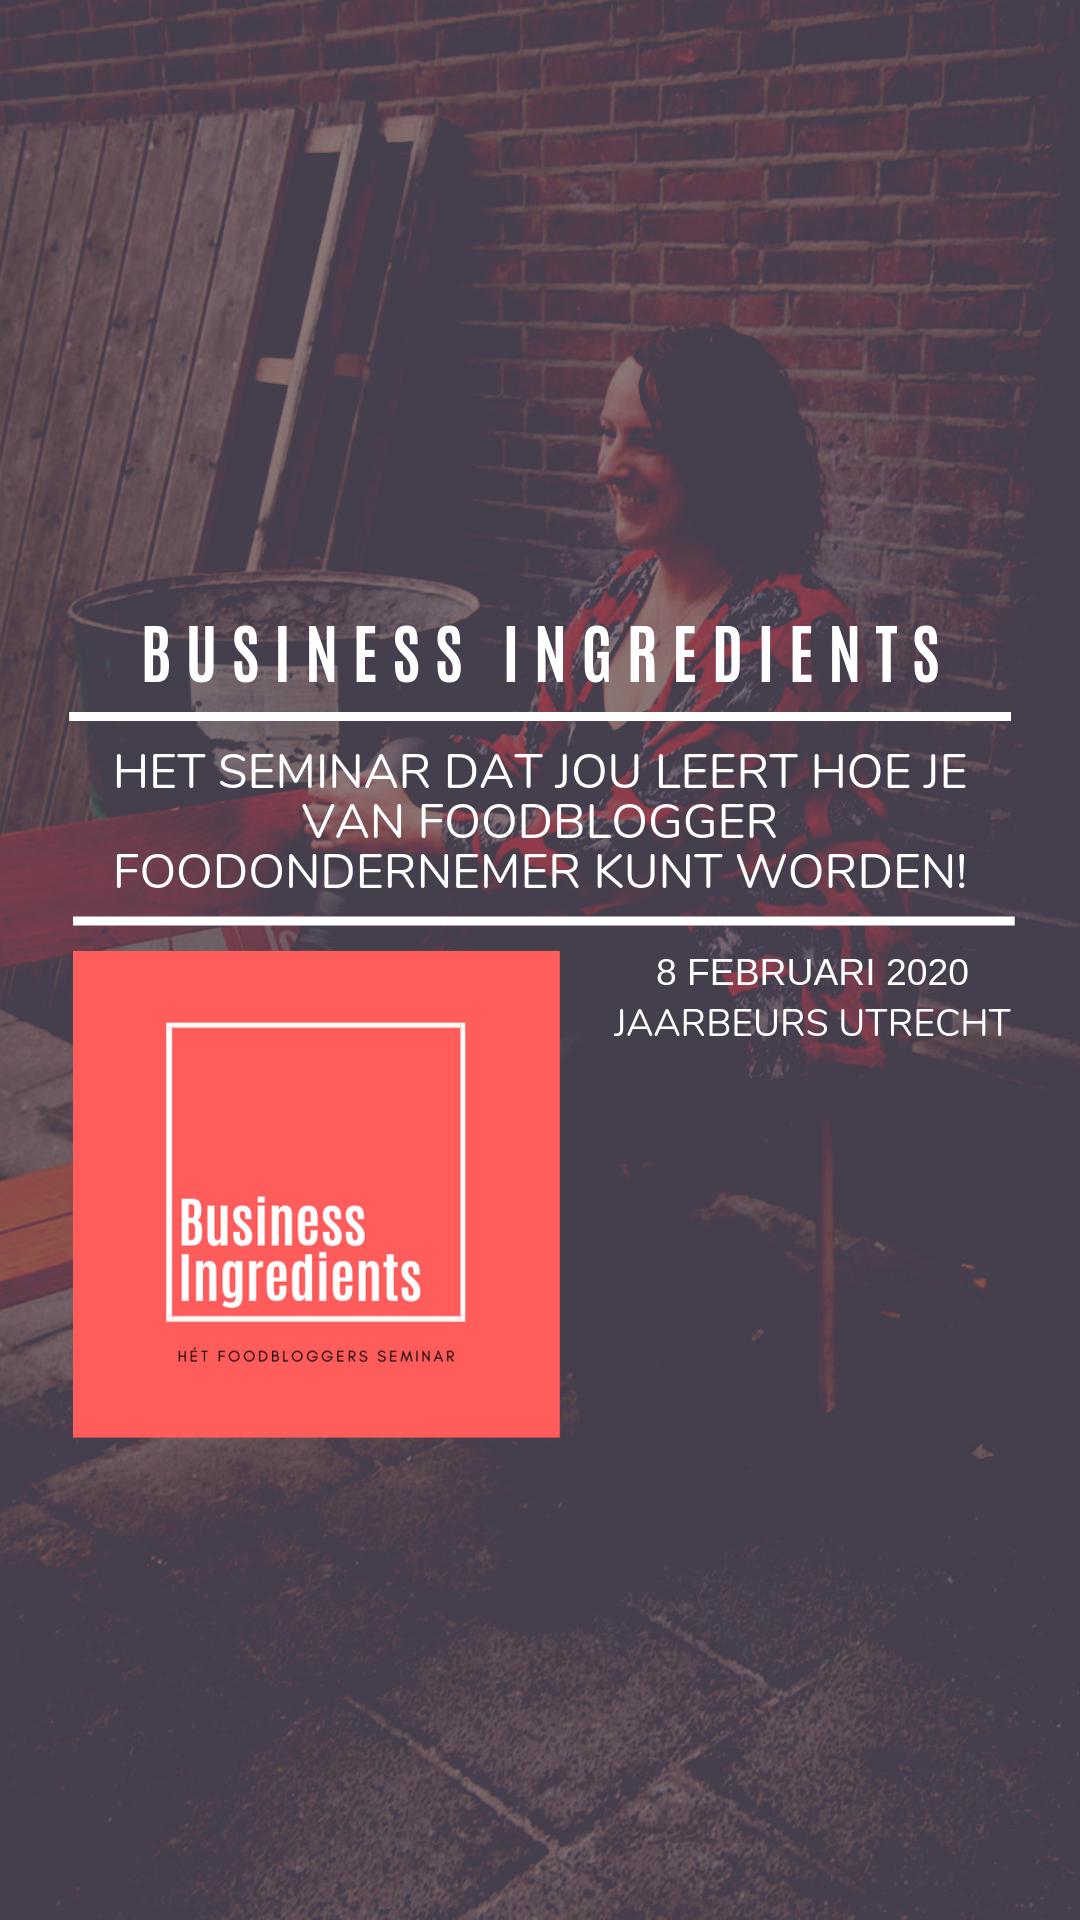 Business Ingredients: het foodbloggers seminar